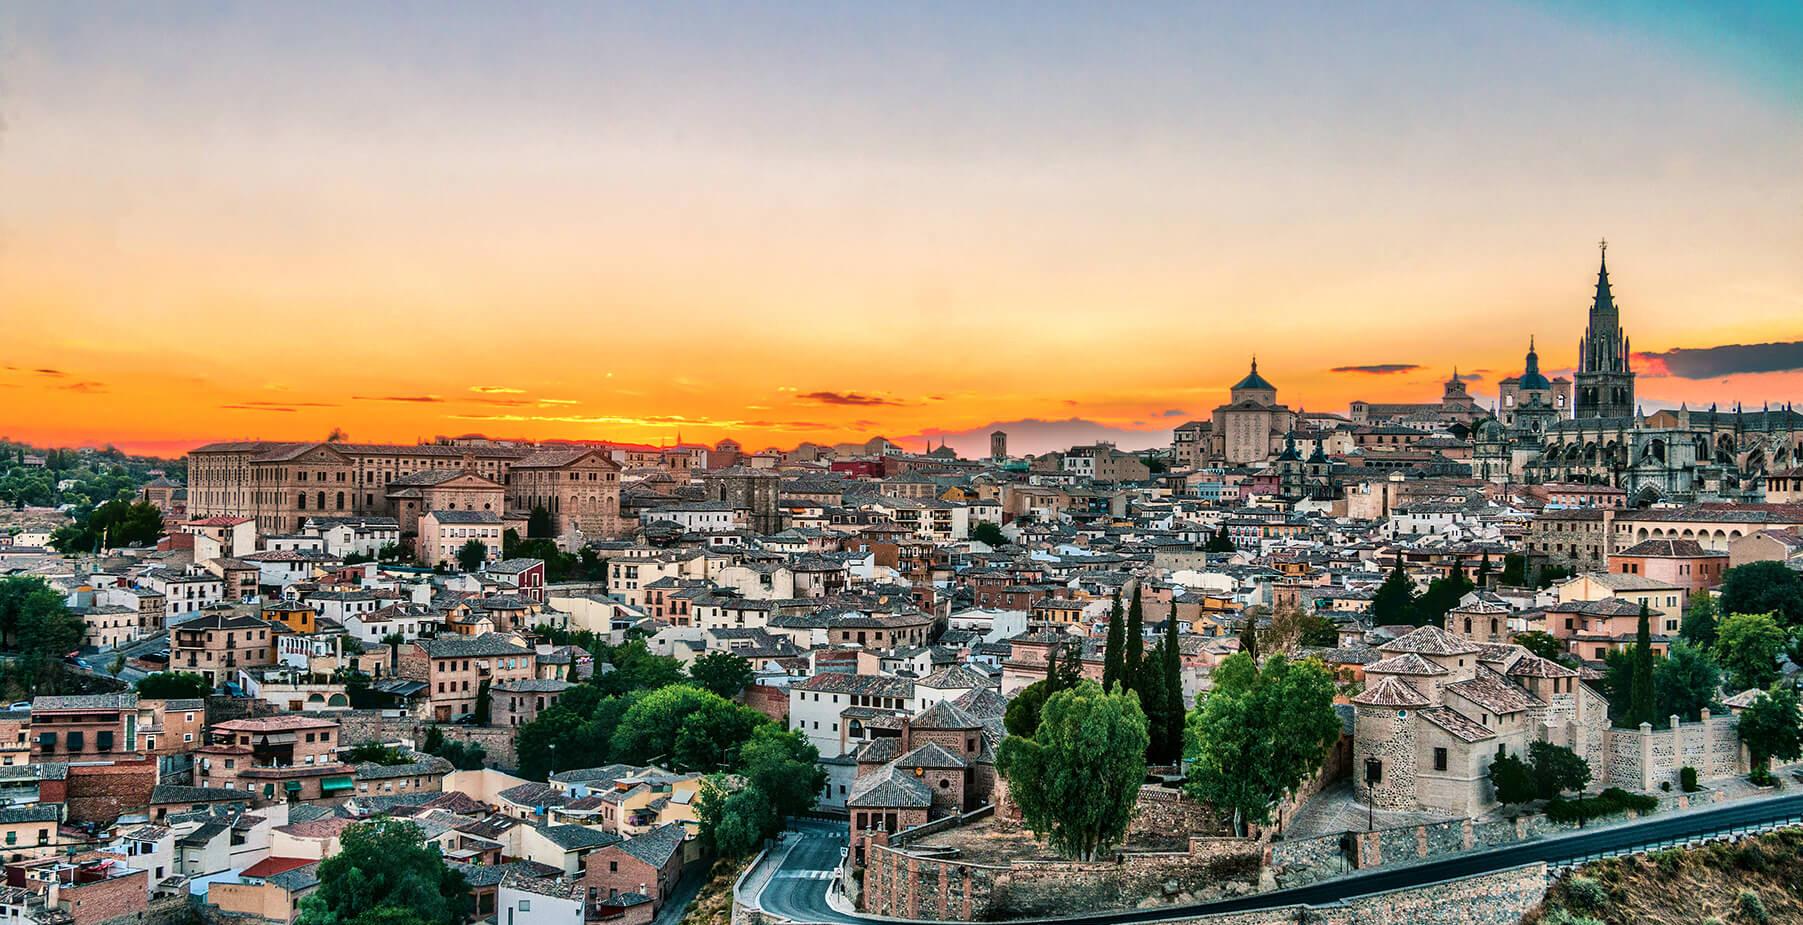 Spain - Toledo